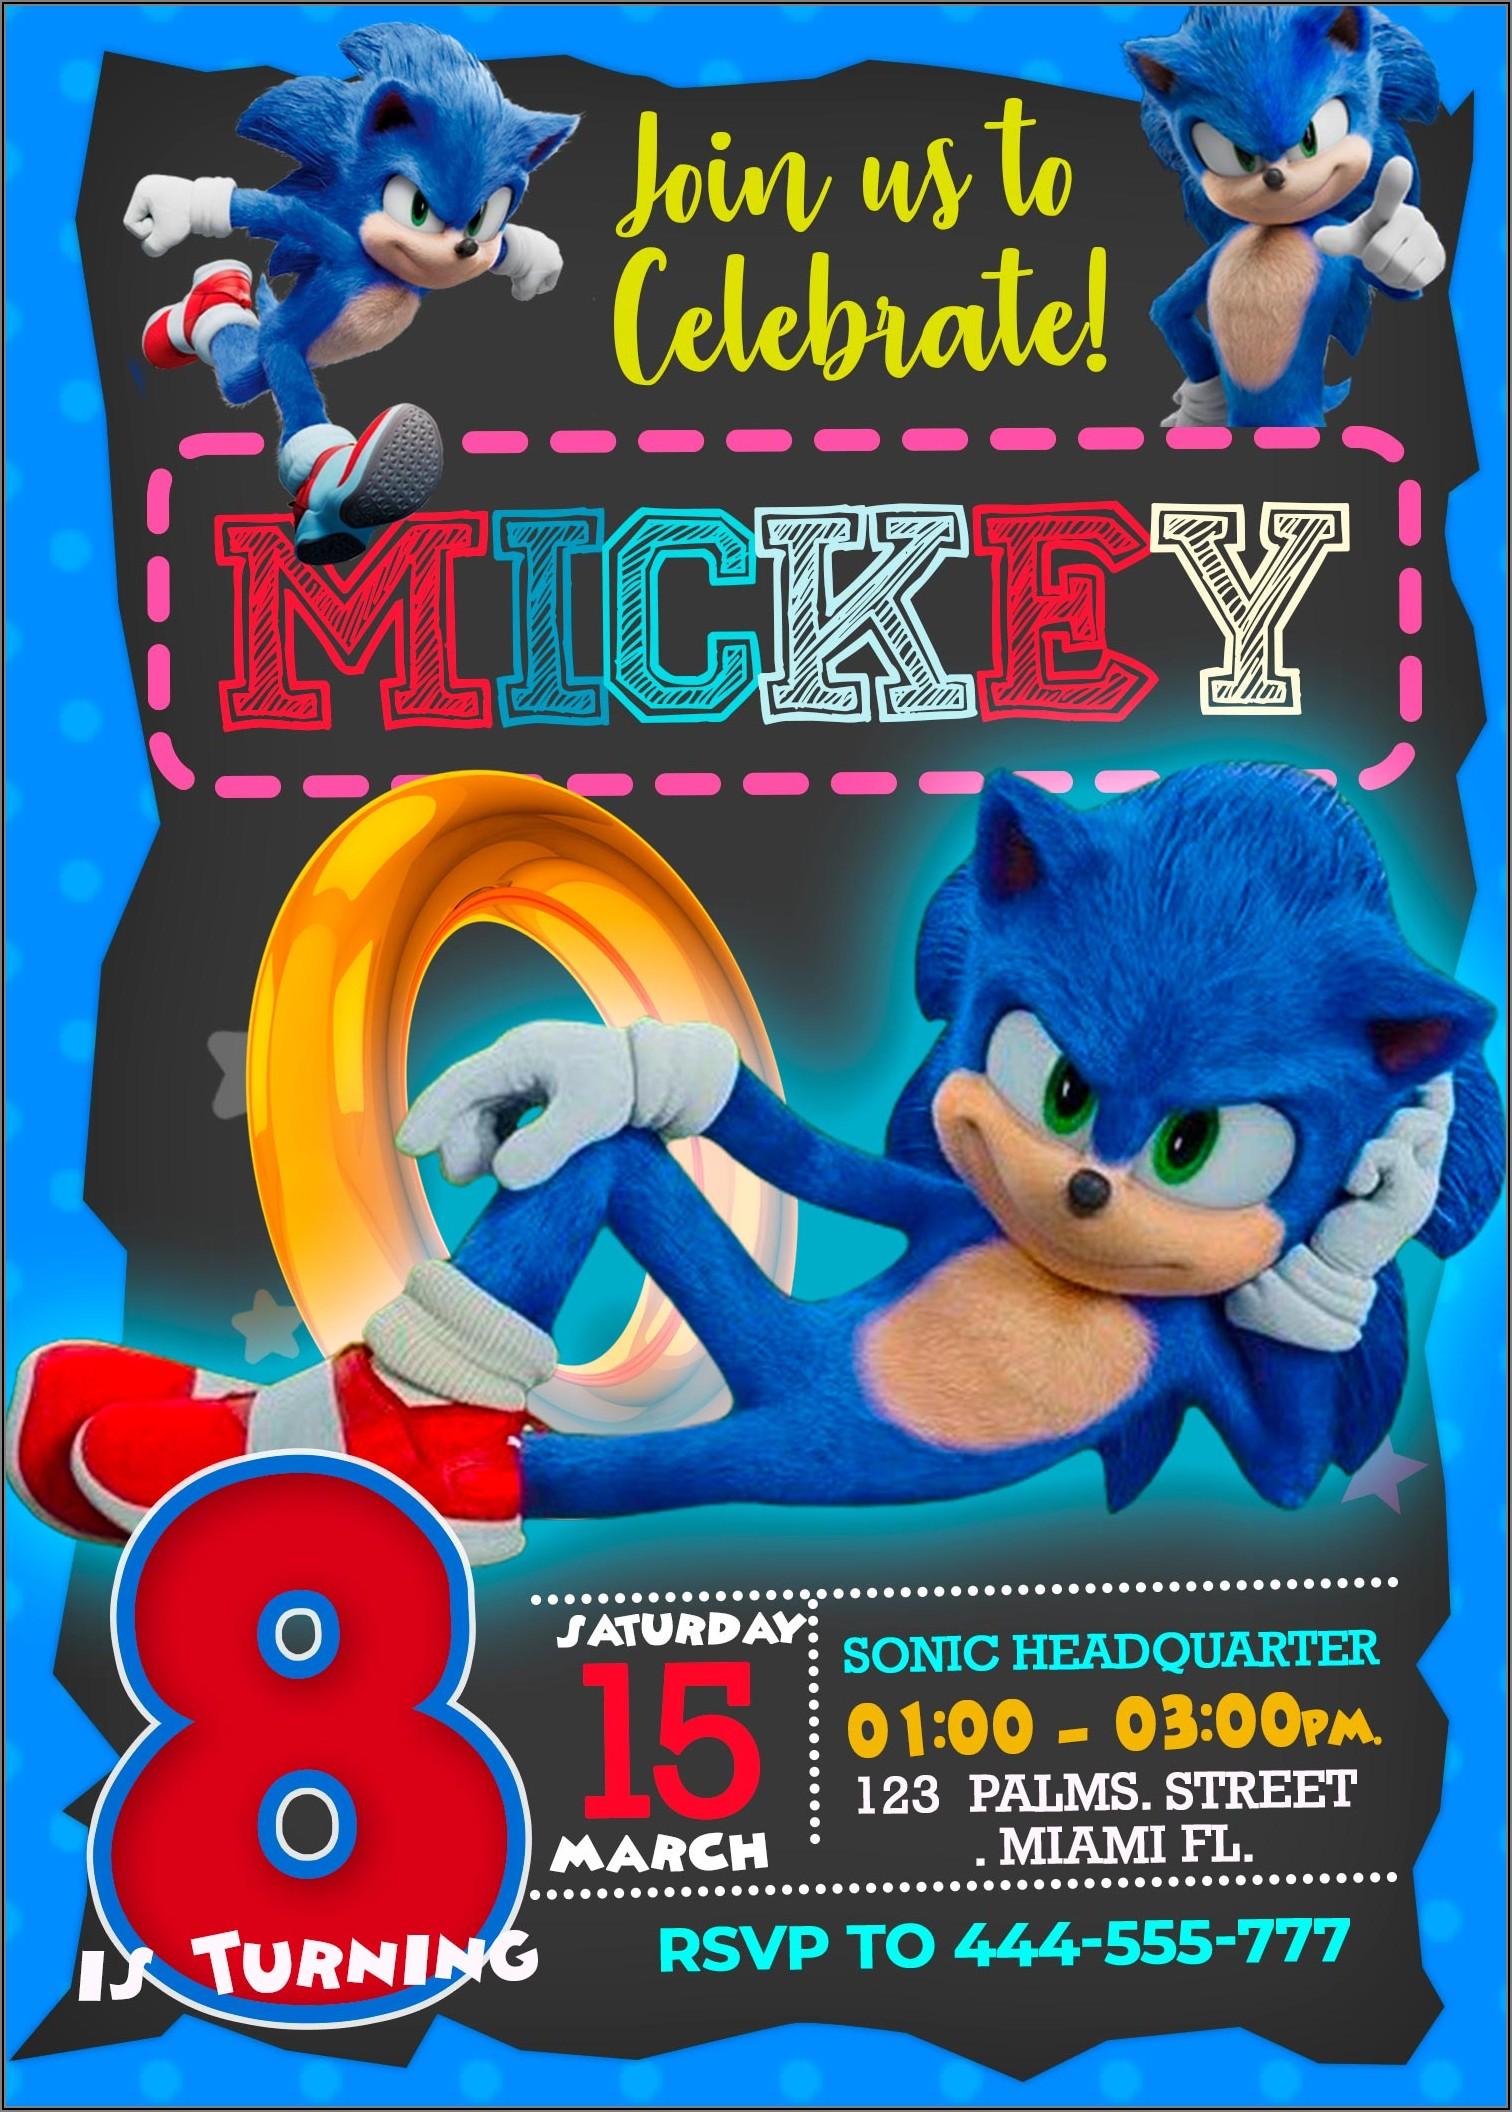 Personalized Sonic Birthday Invitations